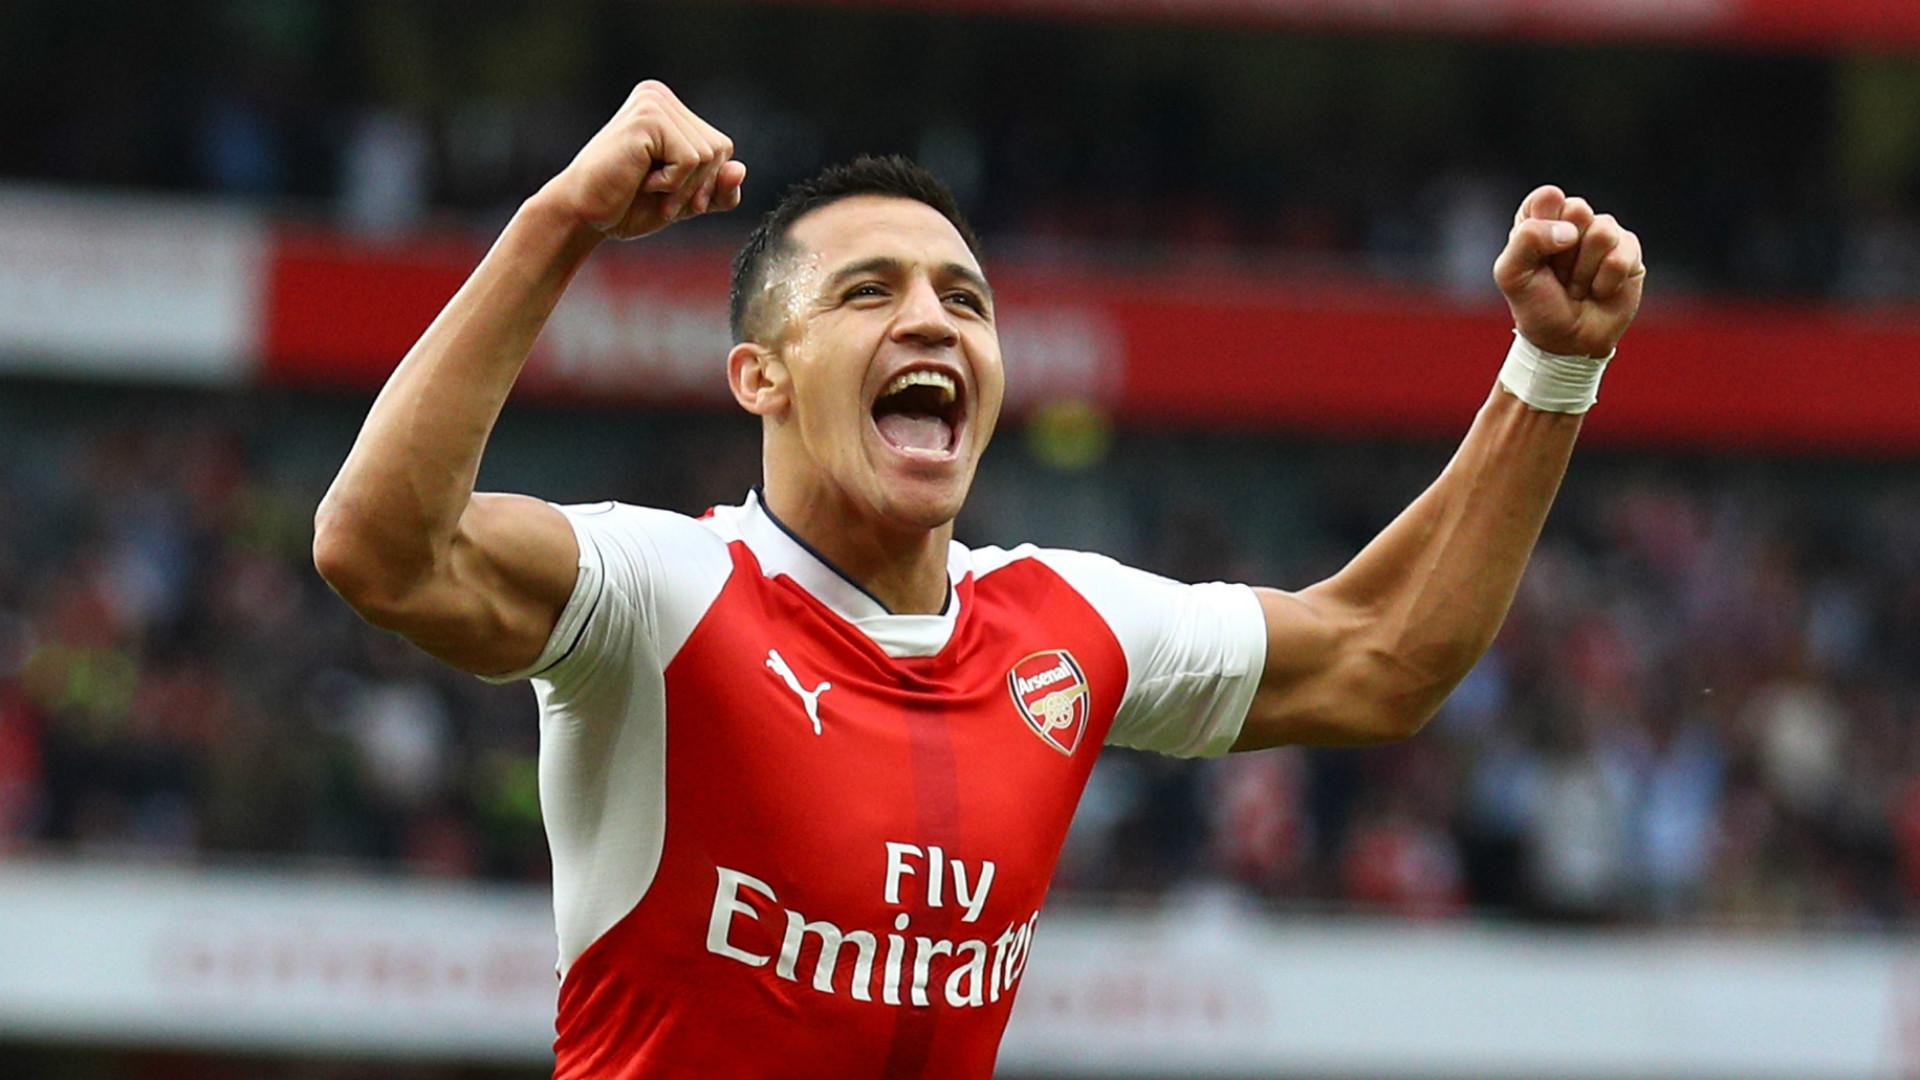 Arsenal beats Burnley 1-0 after injury-time goal